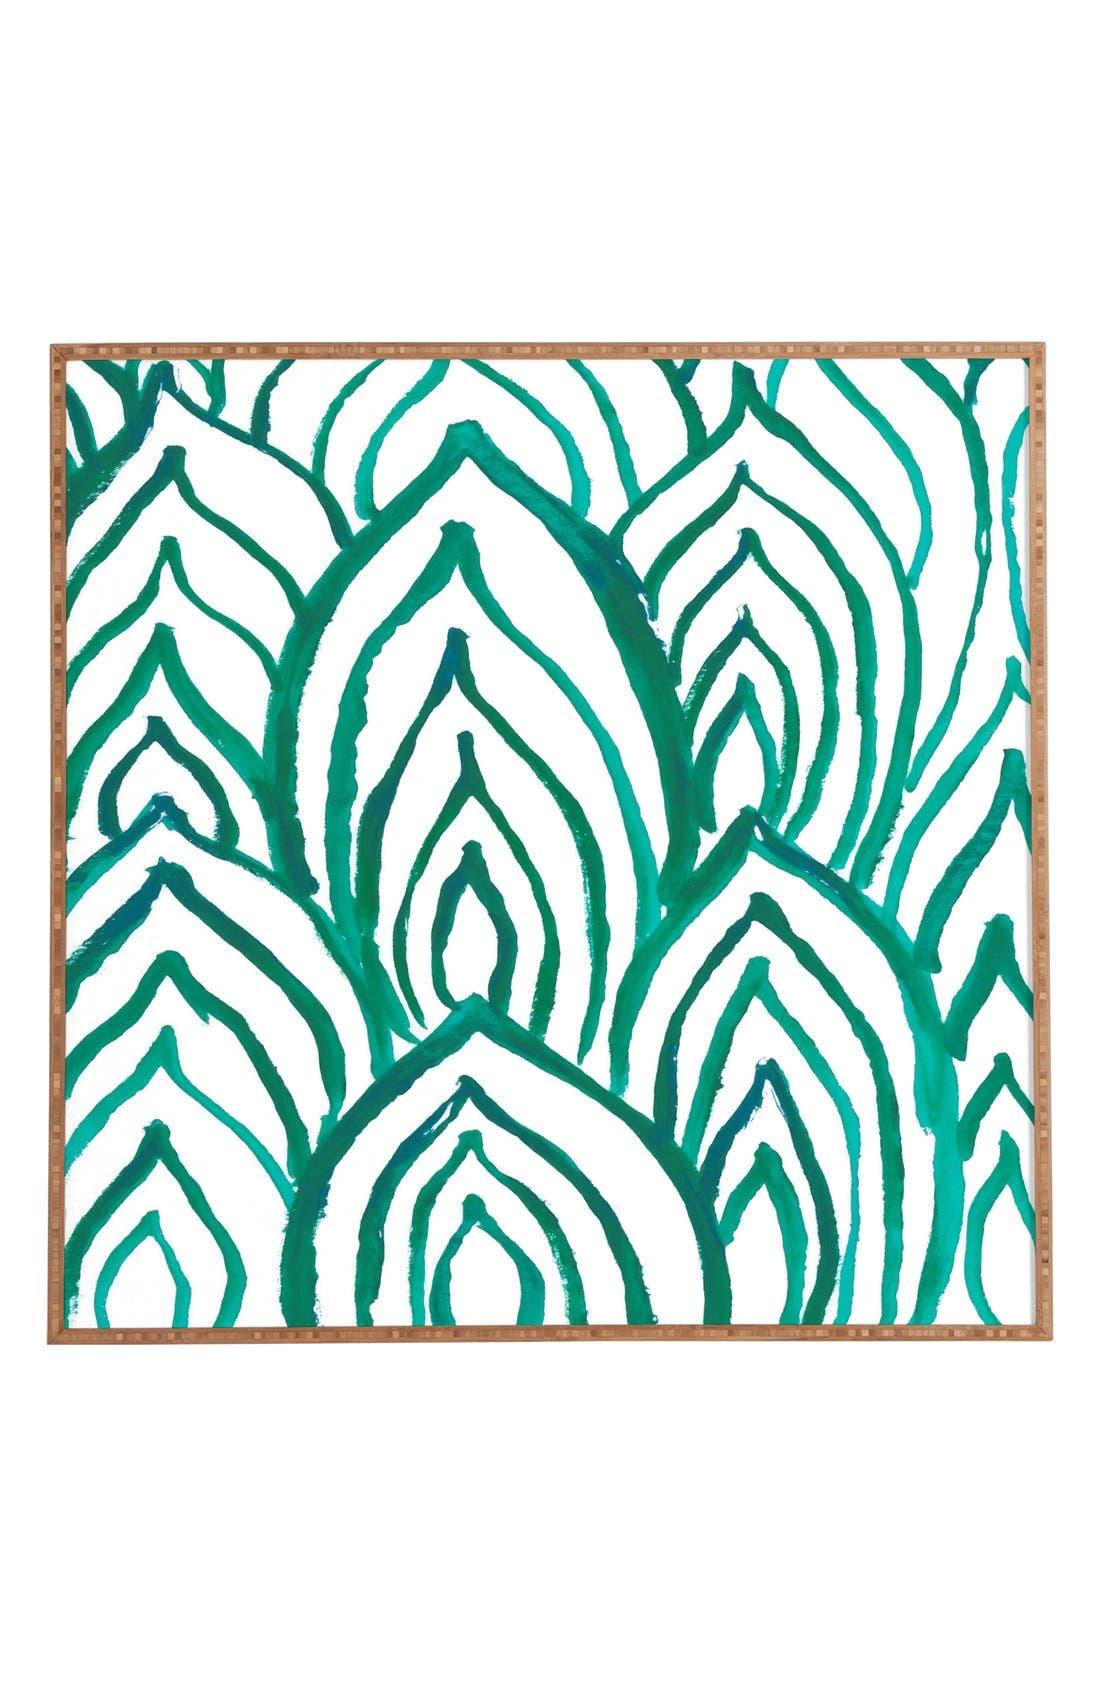 DENY DESIGNS 'Emerald Coast' Framed Wall Art, Main, color, 300